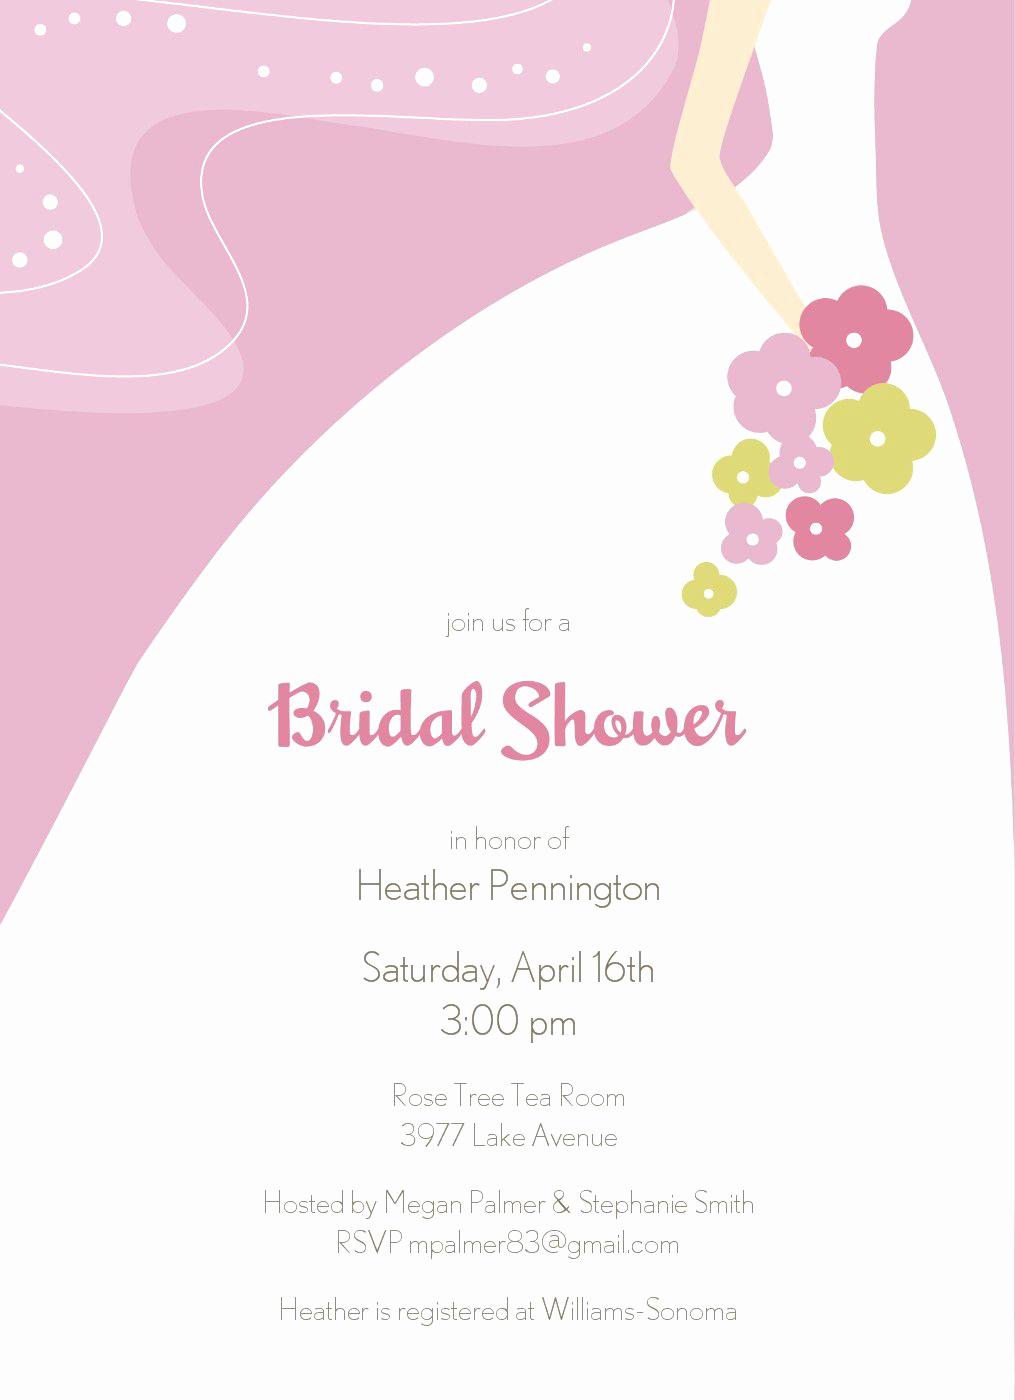 Bridal Shower Invitation Template Best Of Angry Bird Invitations Templates Ideas Diy Angry Birds